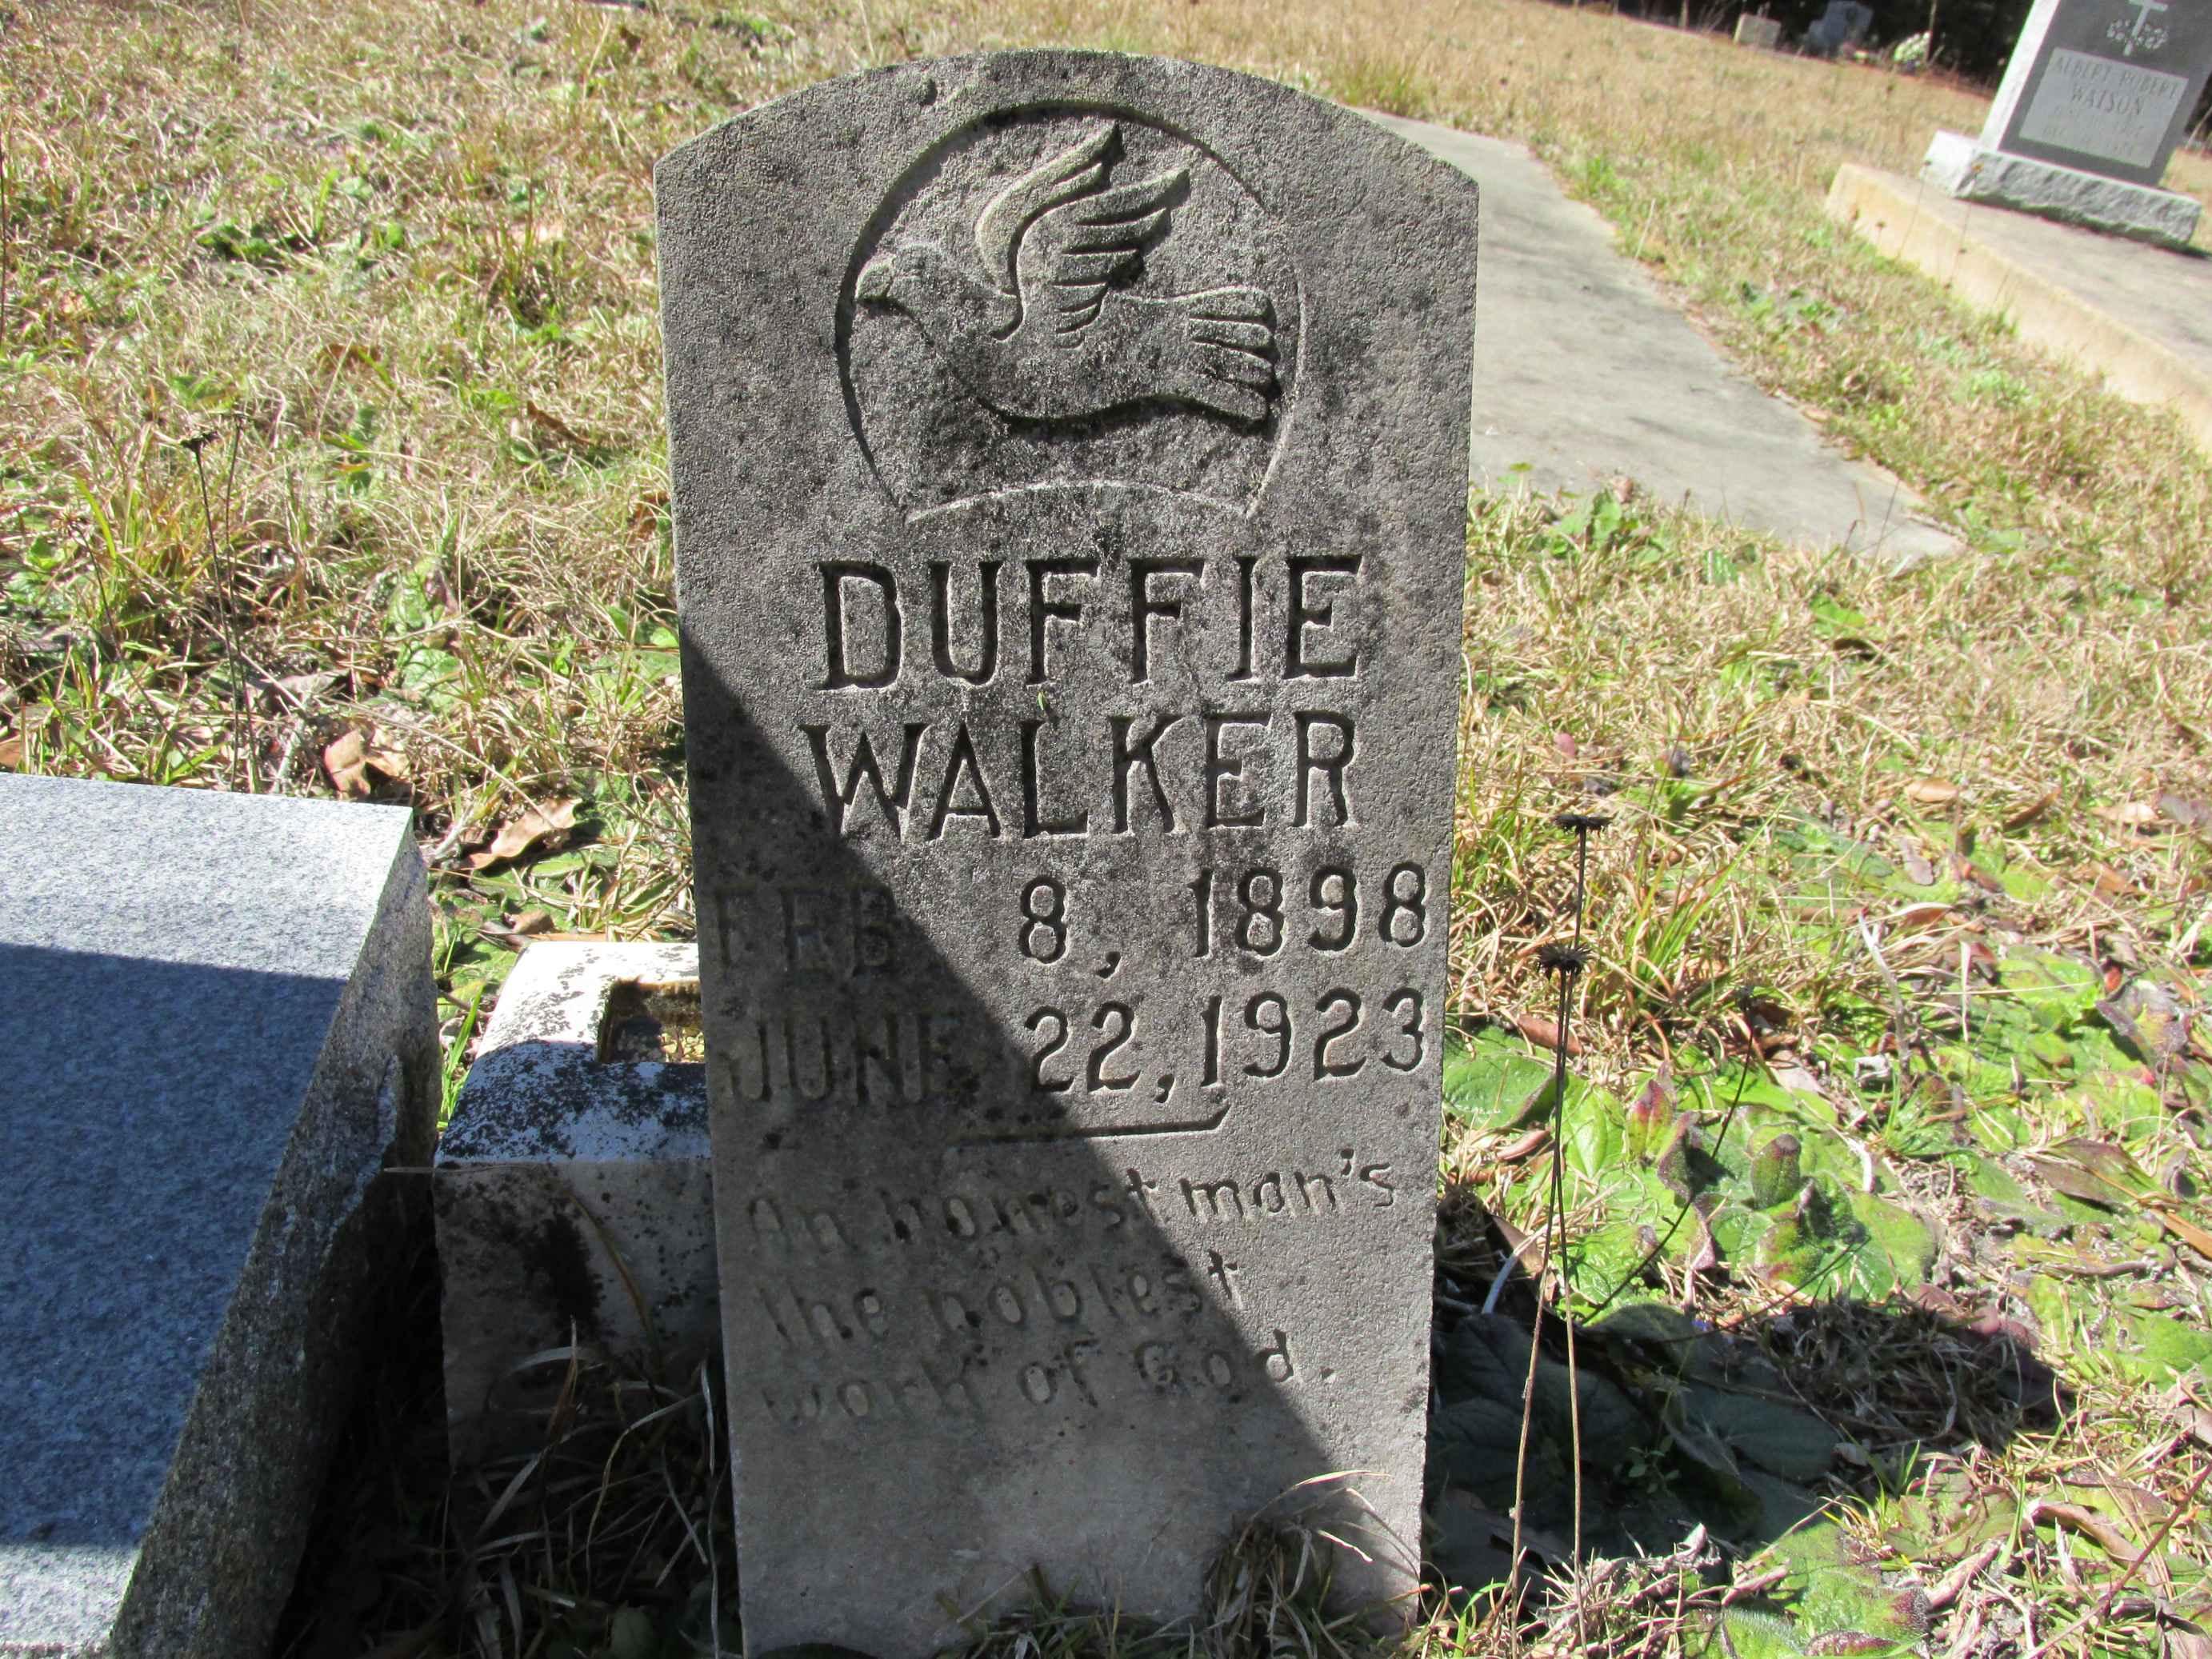 Duffie Headstone_Findagrave